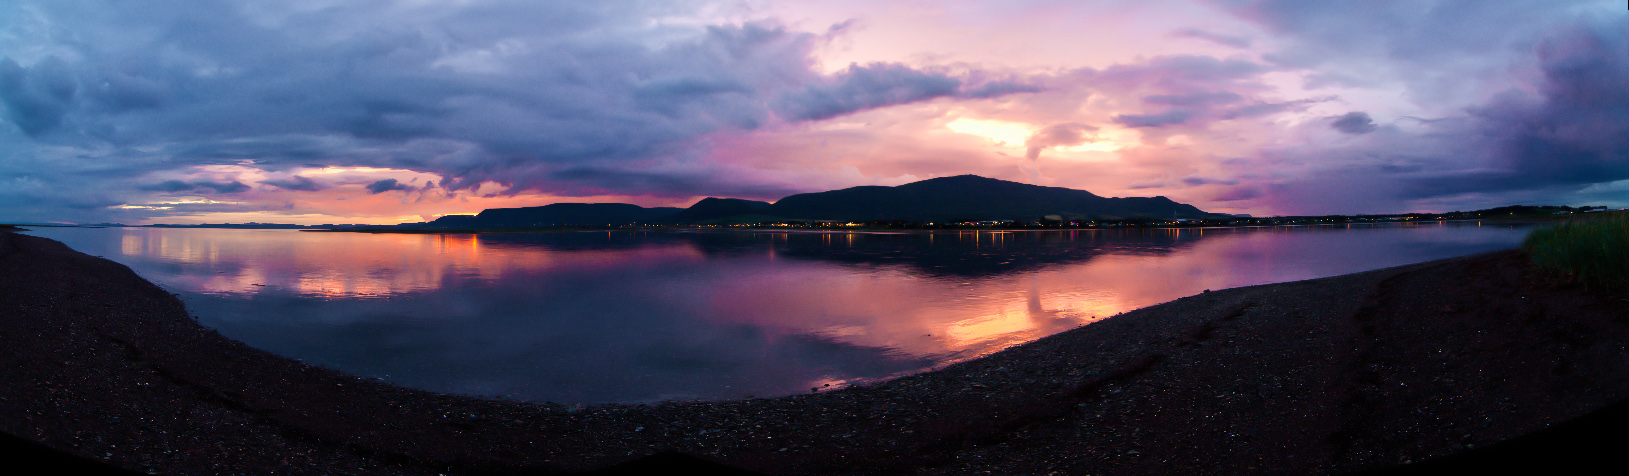 Sunset in Quebec